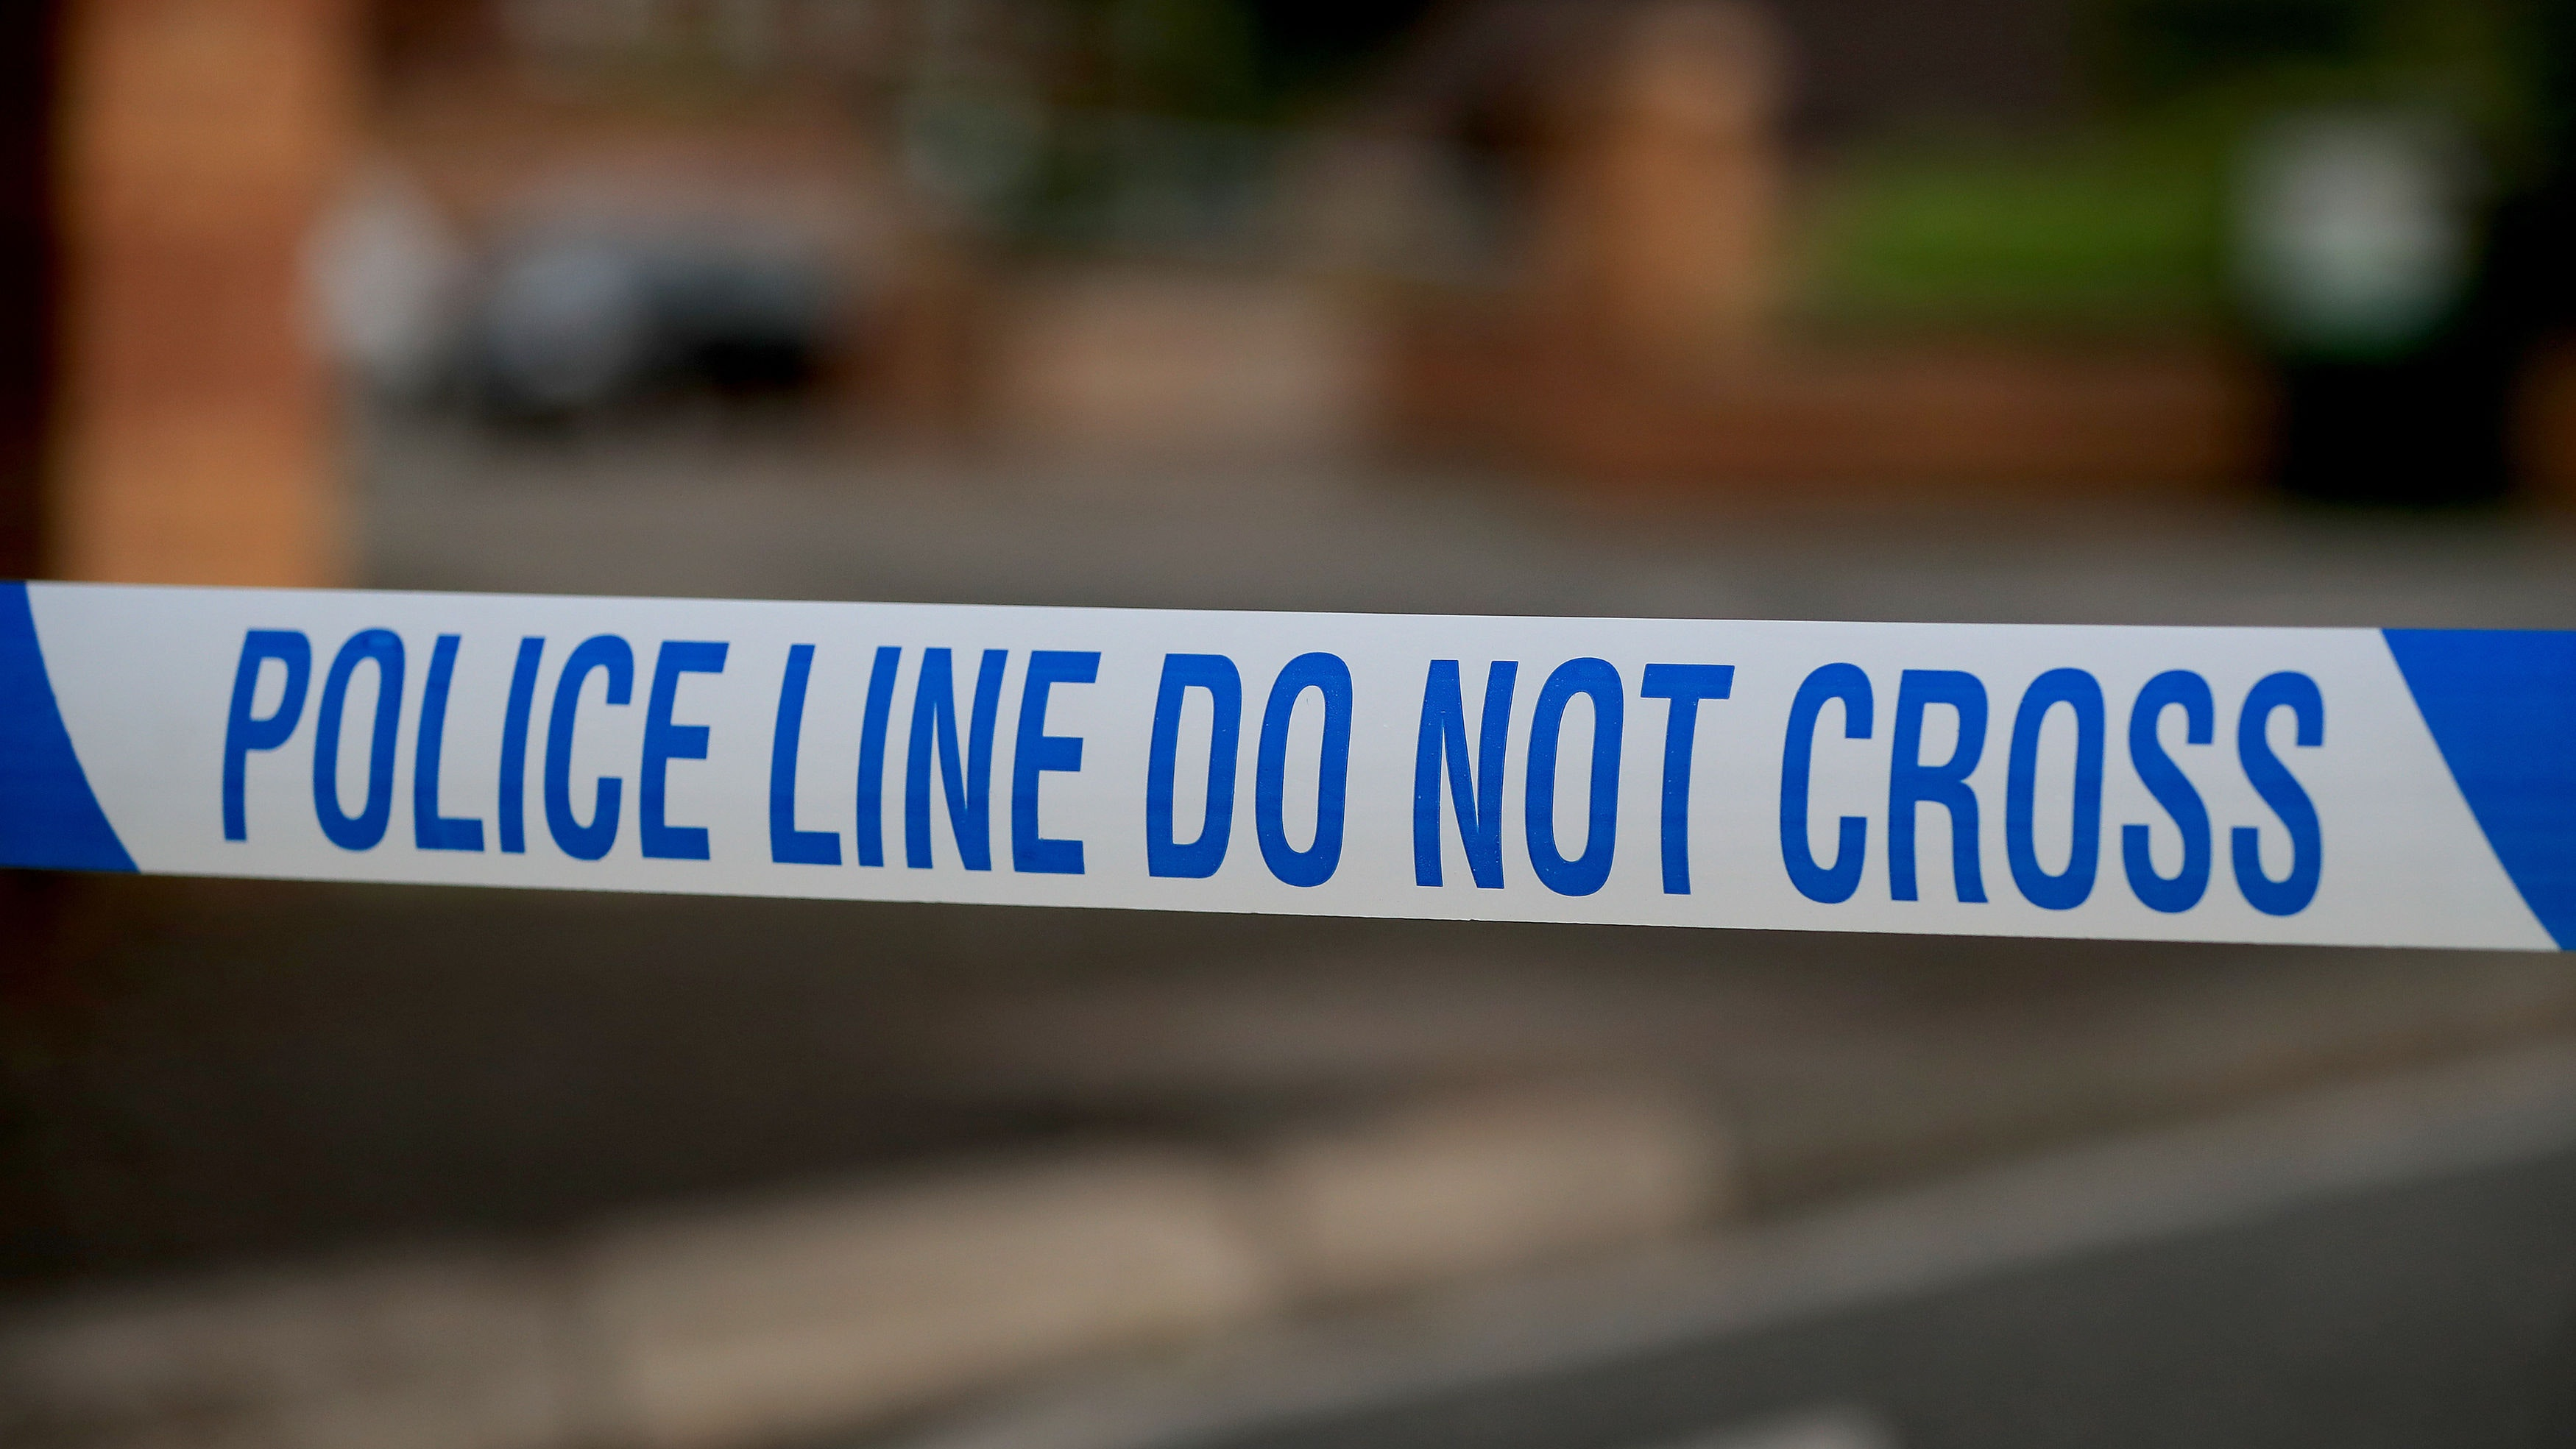 Murder inquiry as woman's body found in Camden flat